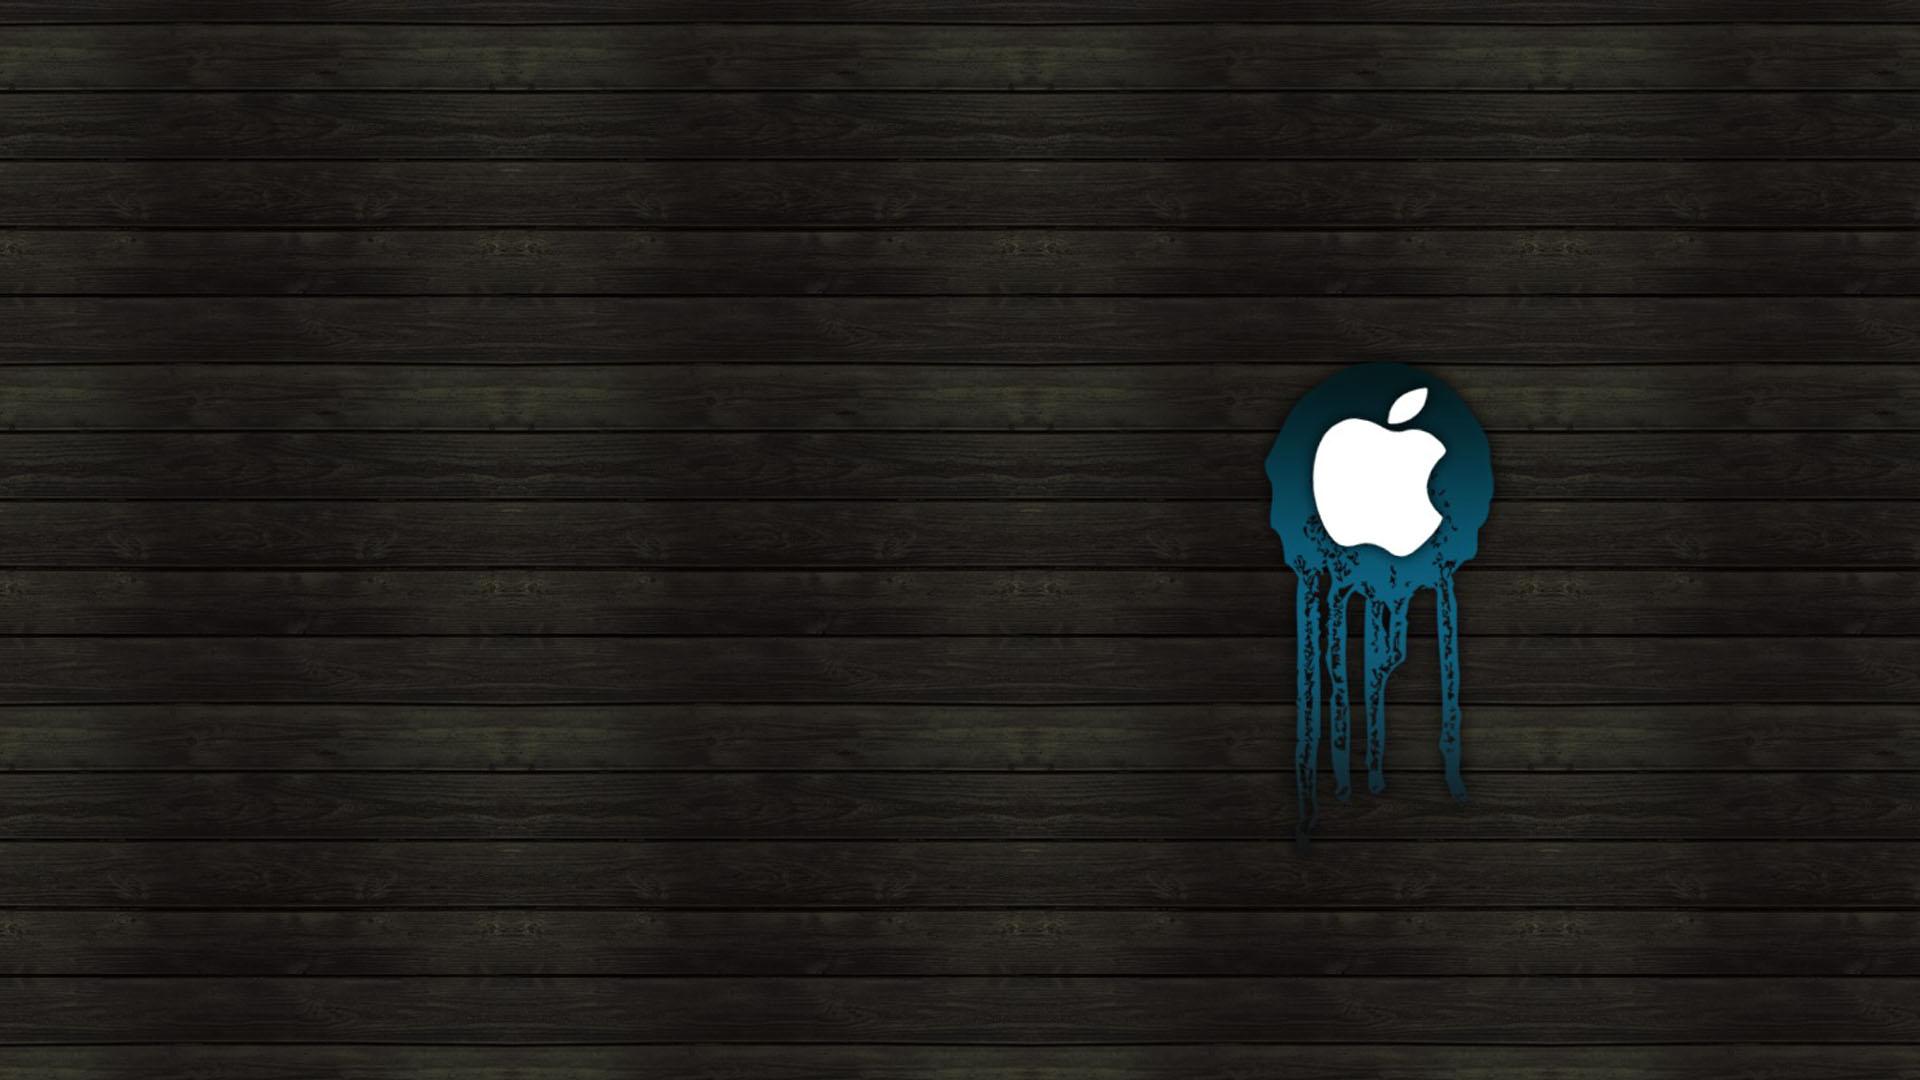 hd macbook air logo wallpapers pixelstalk net